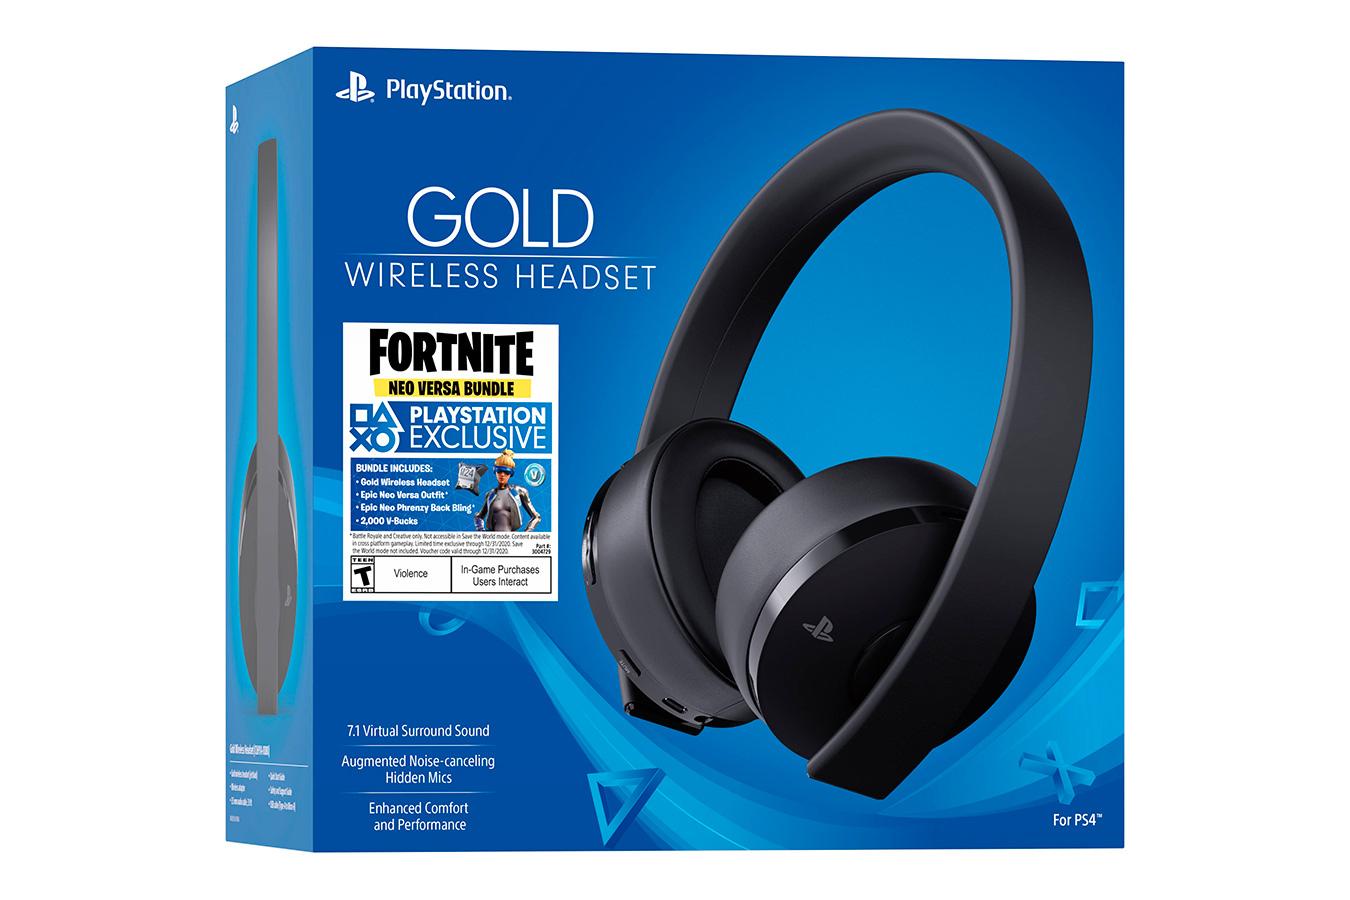 Sony Wireless Headset Gold Fortnite bundle [PS4SHFB]